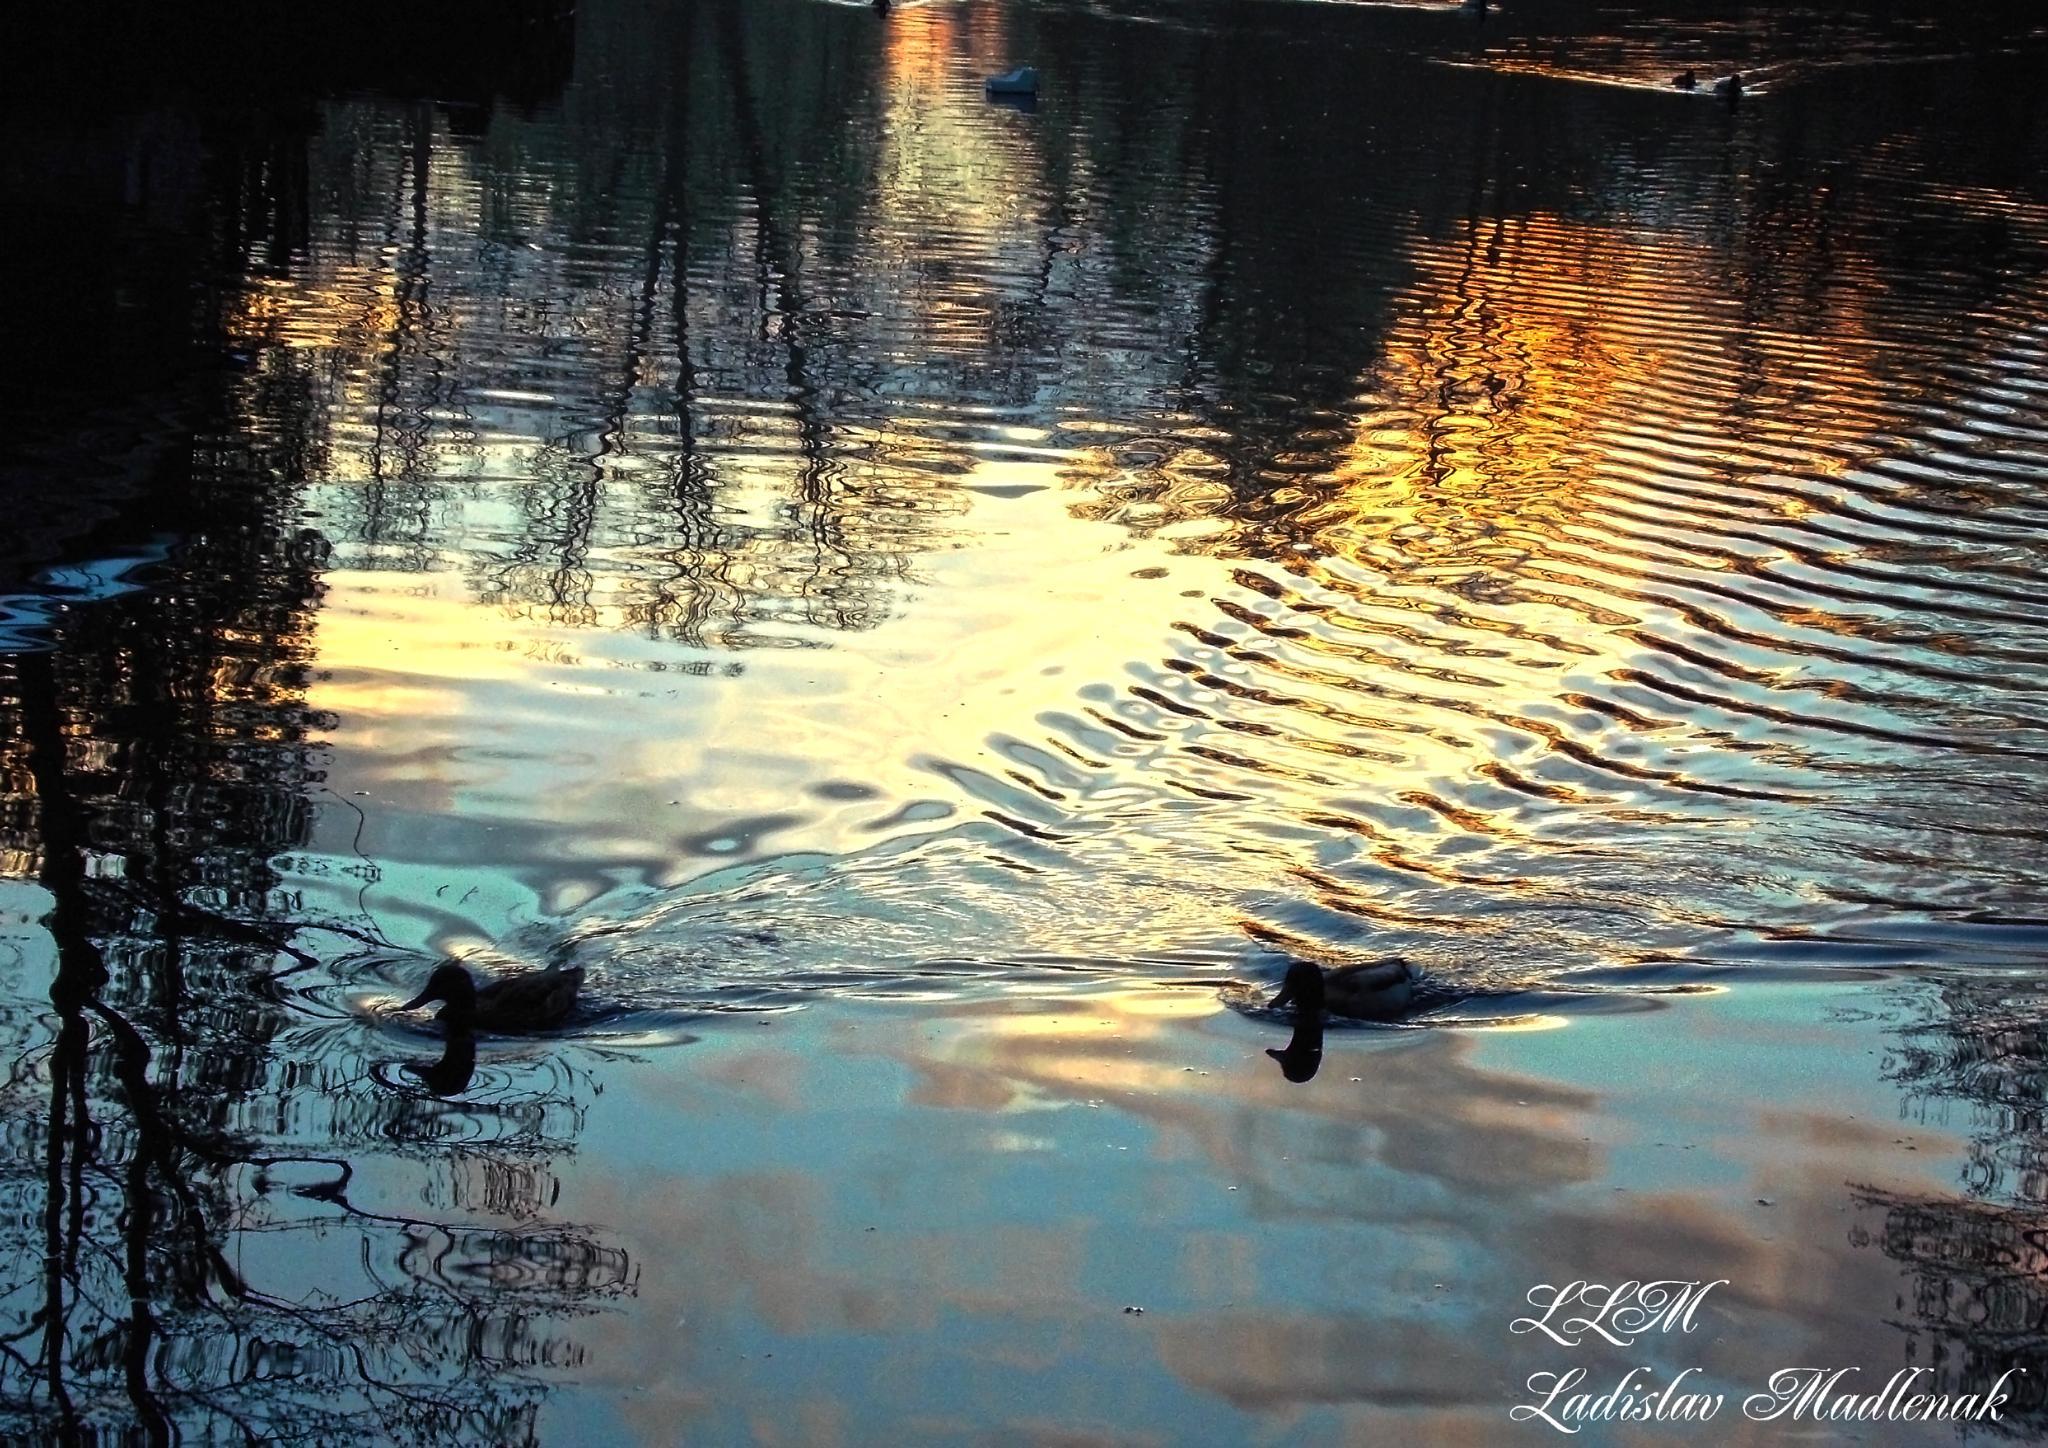 Reflection by LLadislav Madlenak